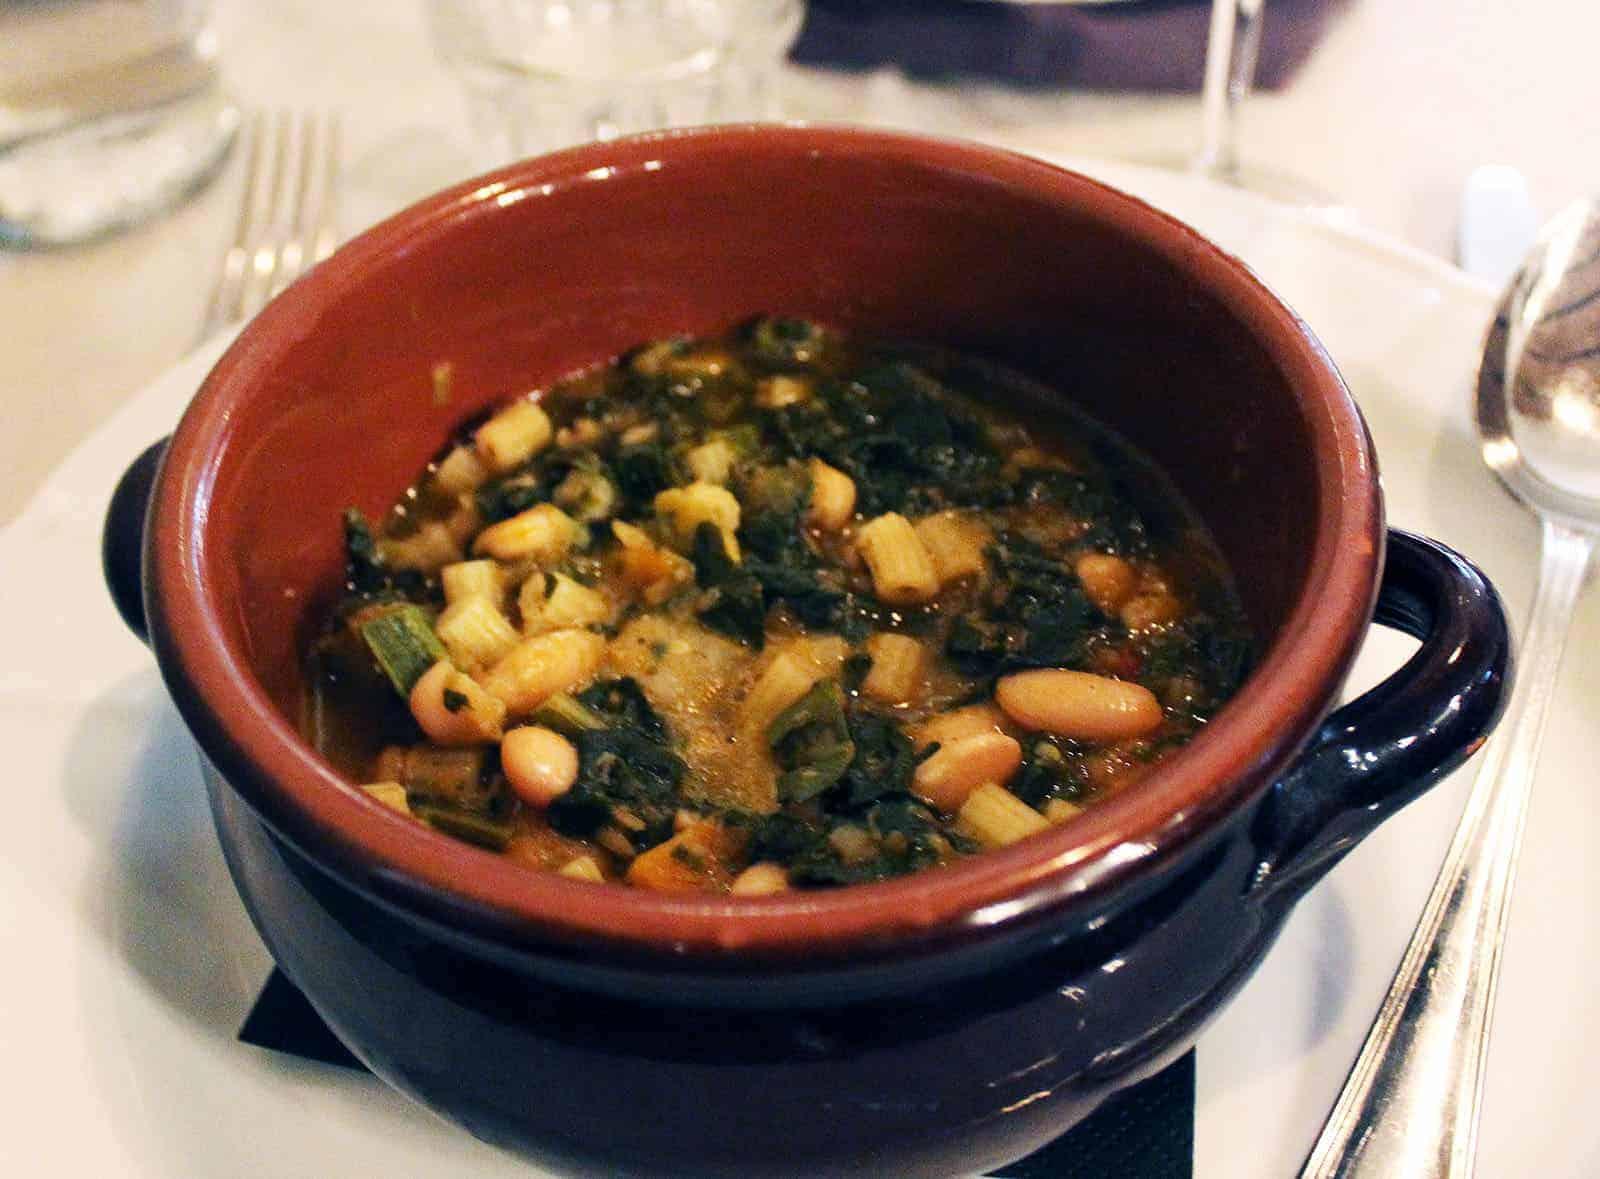 Authentic Tuscan cuisine gone vegan at Konnubio Florence